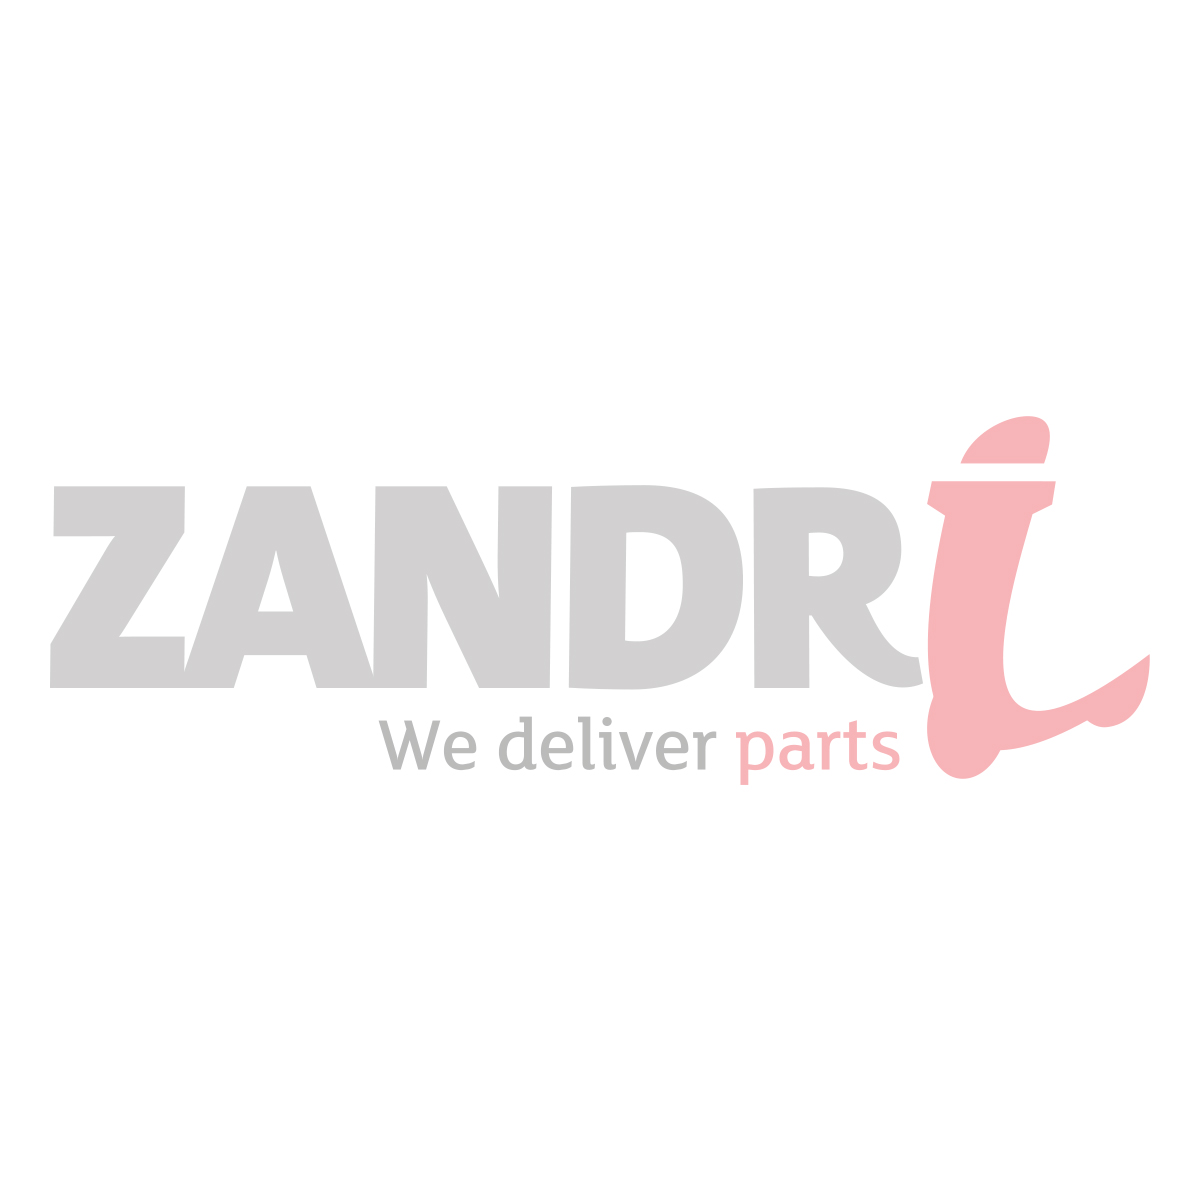 Voorspatbord stang Zundapp 517 (oud type)  chroom (2-delig) z517-19.902s/3s